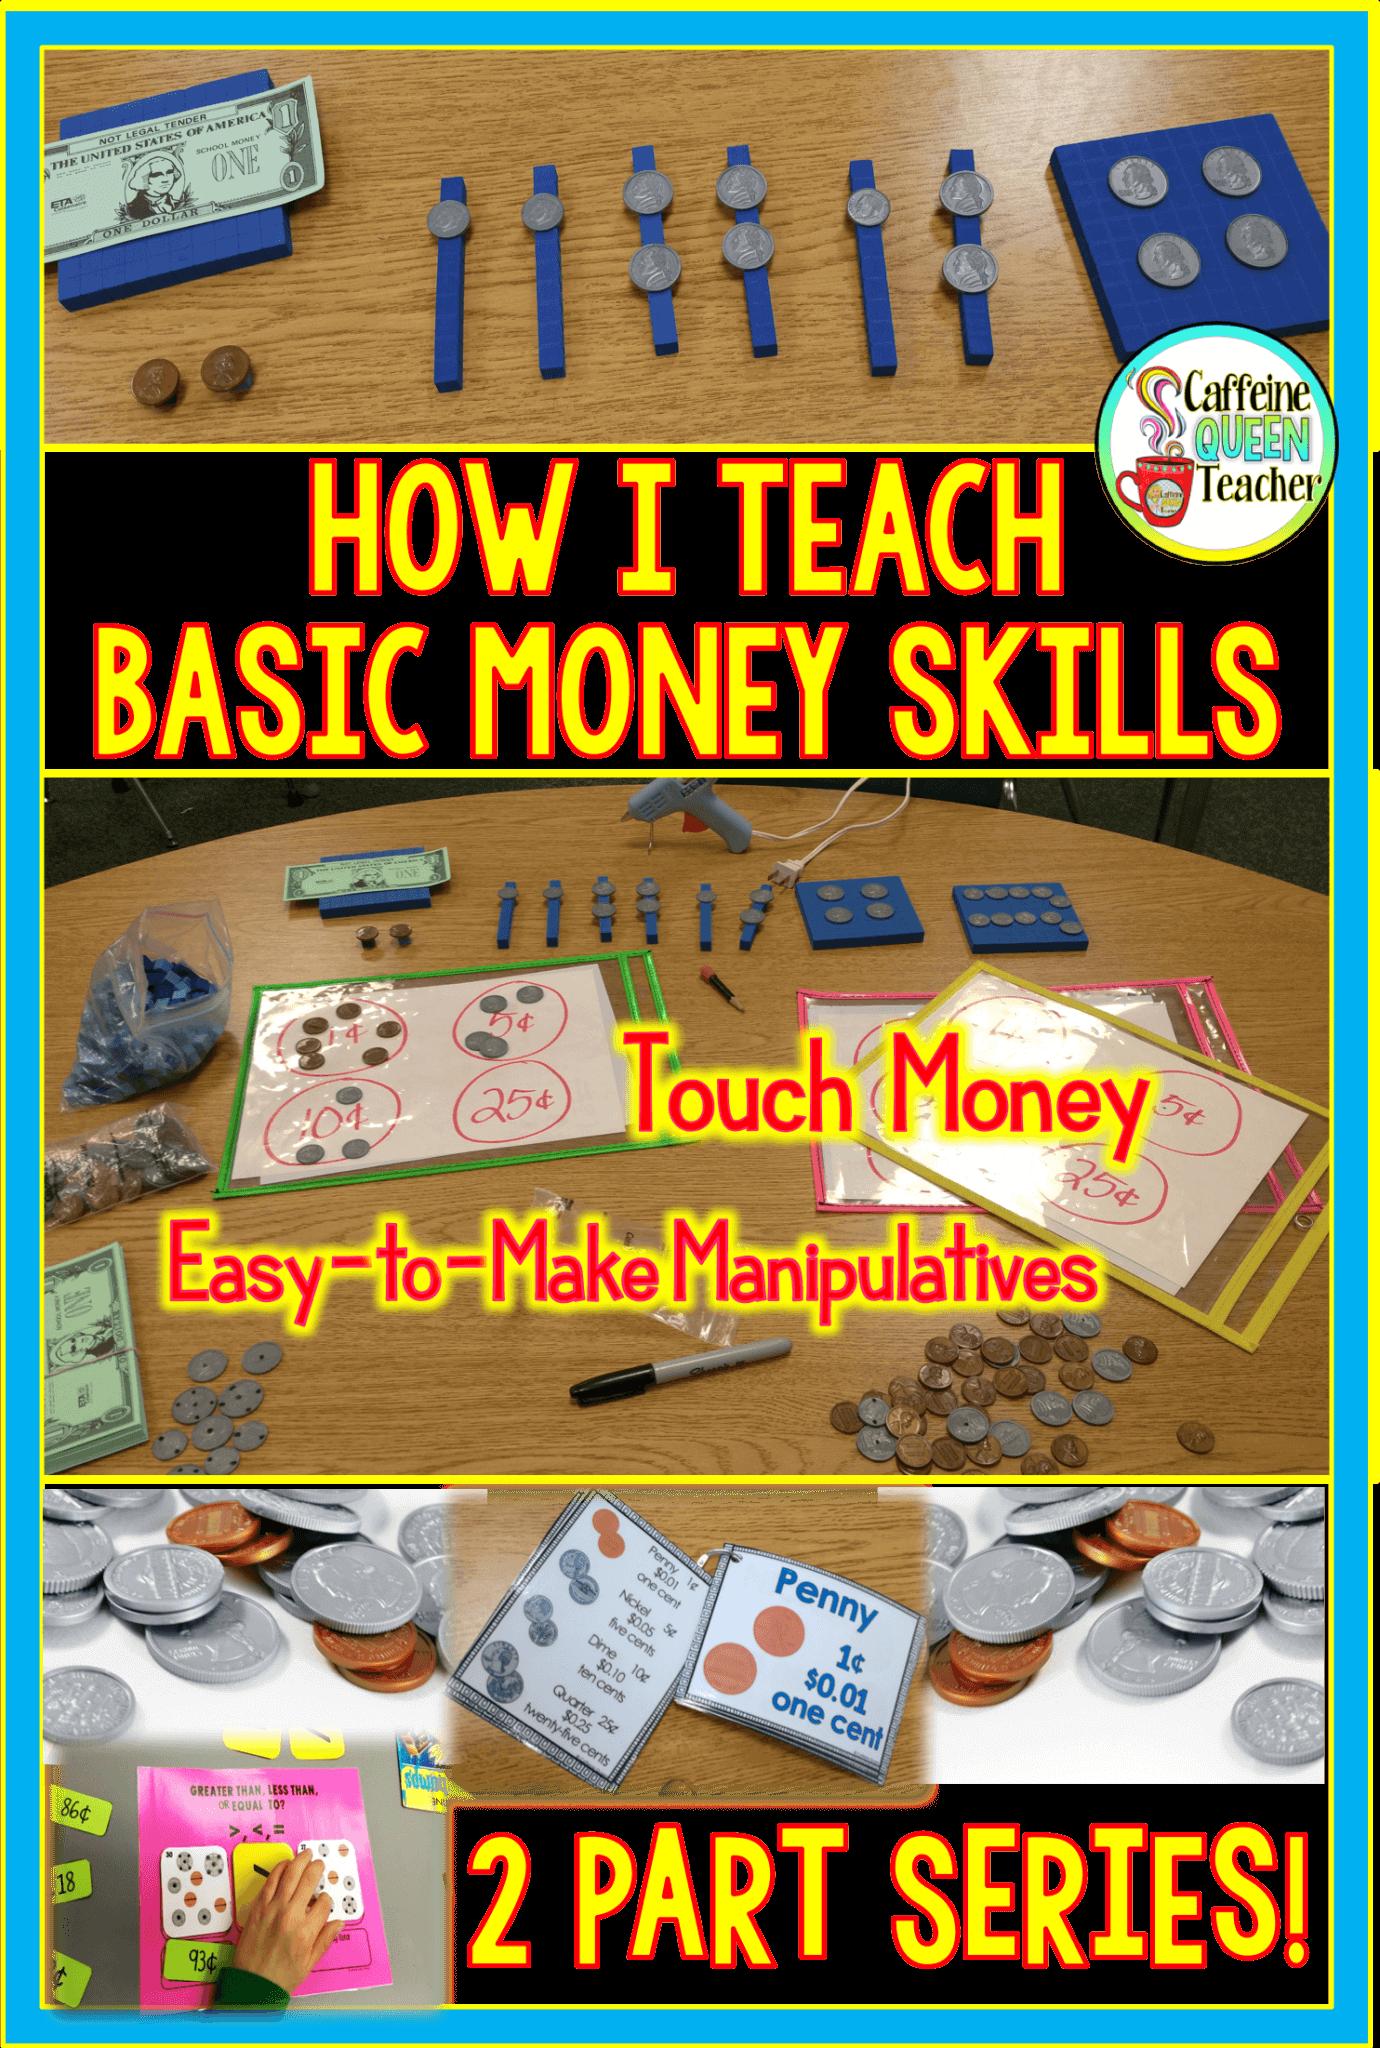 Teaching basic money skills to students